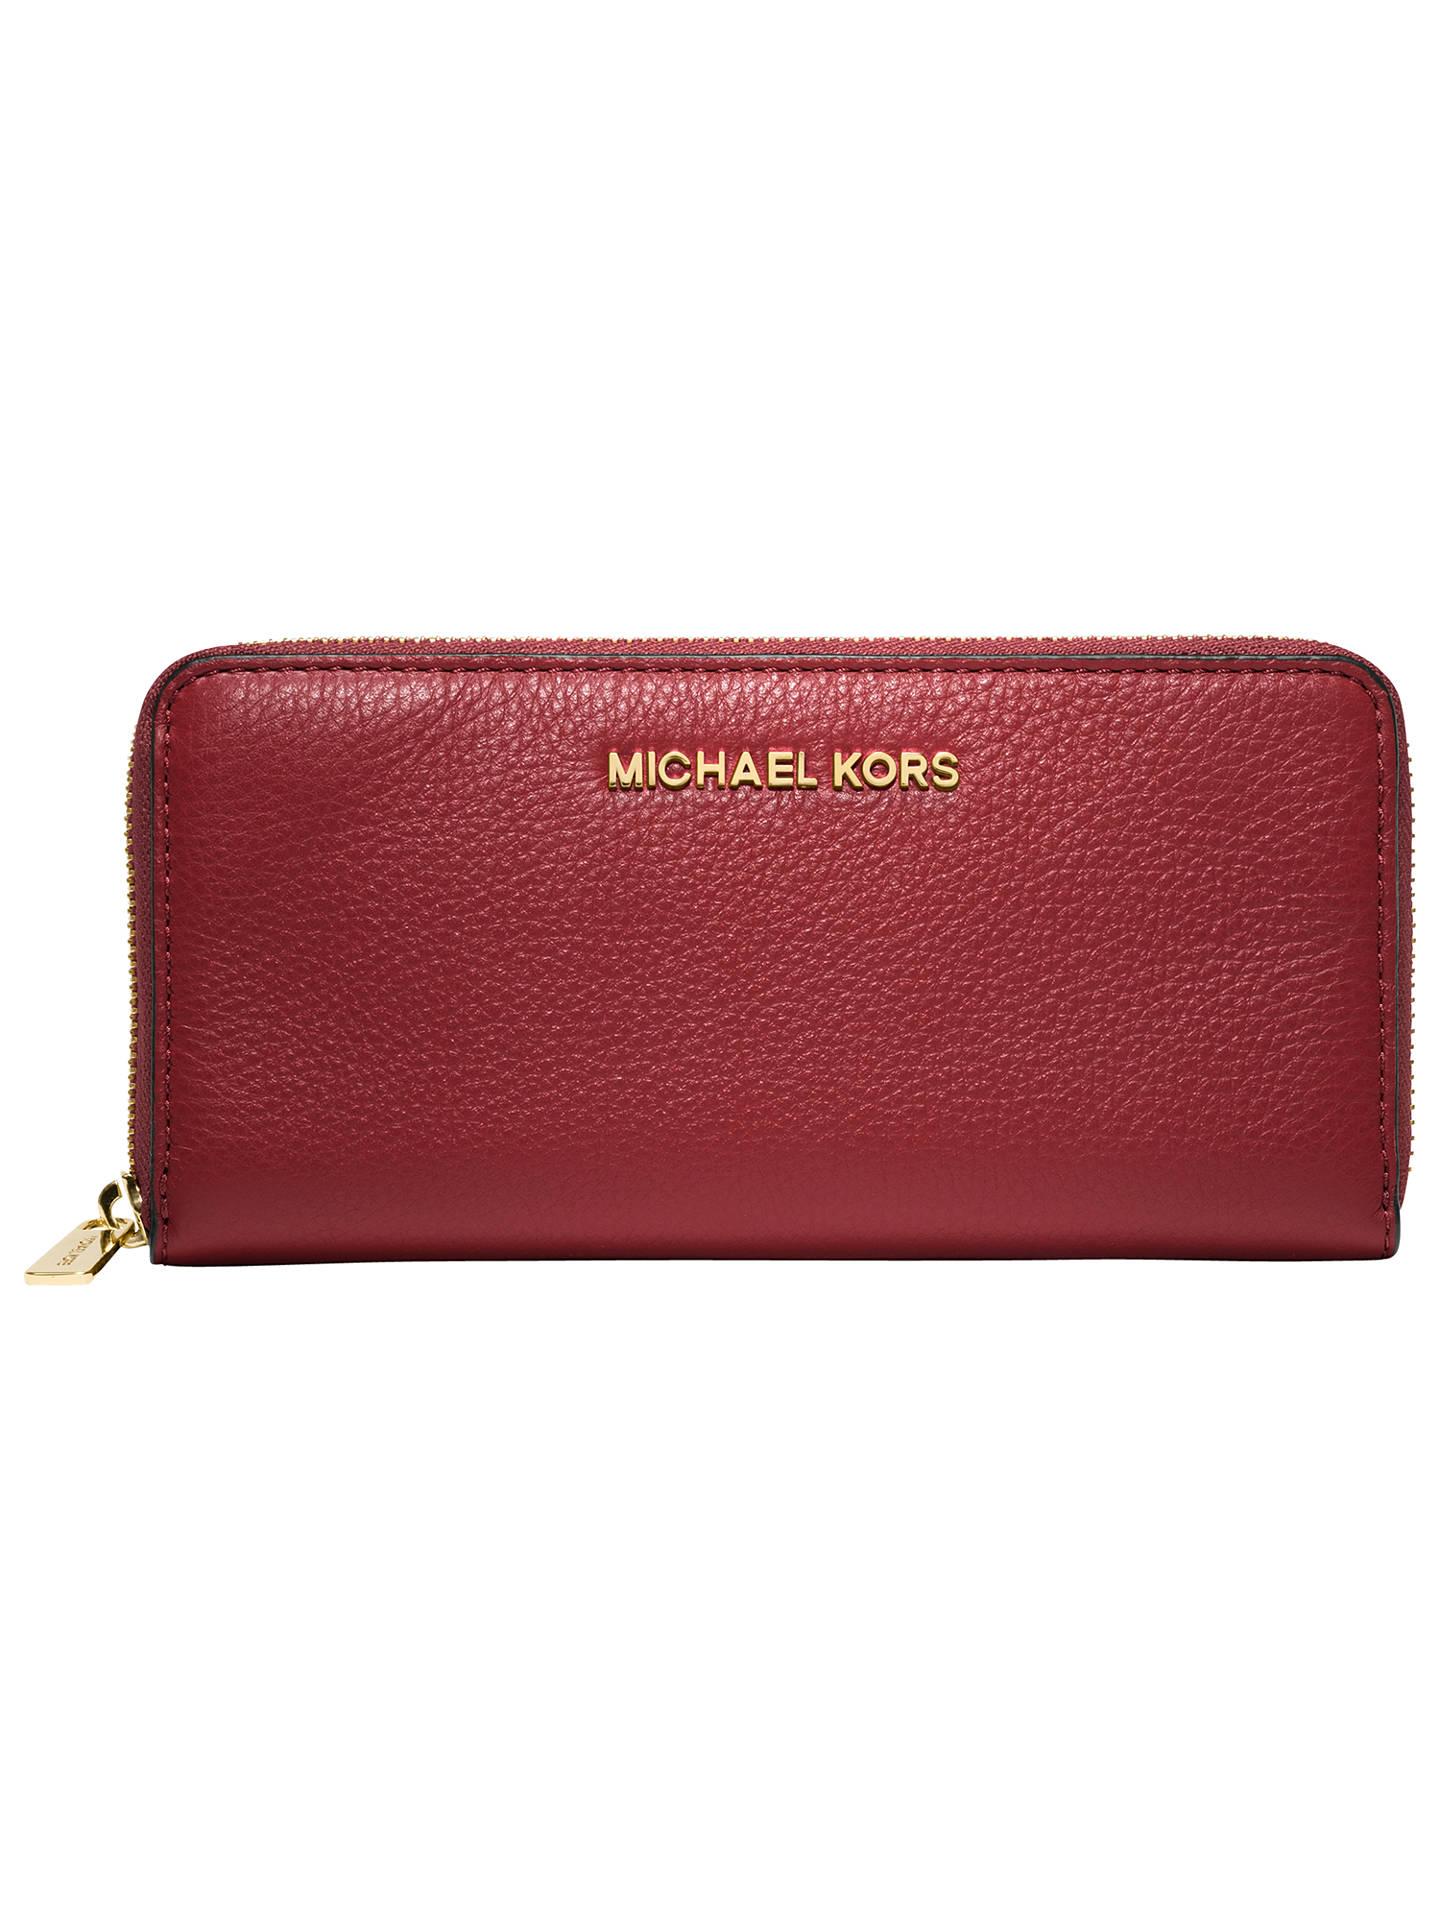 a19c7e8e91fcb5 Buy MICHAEL Michael Kors Jet Set Travel Leather Zip Around Continental Purse,  Grainy Red Online ...